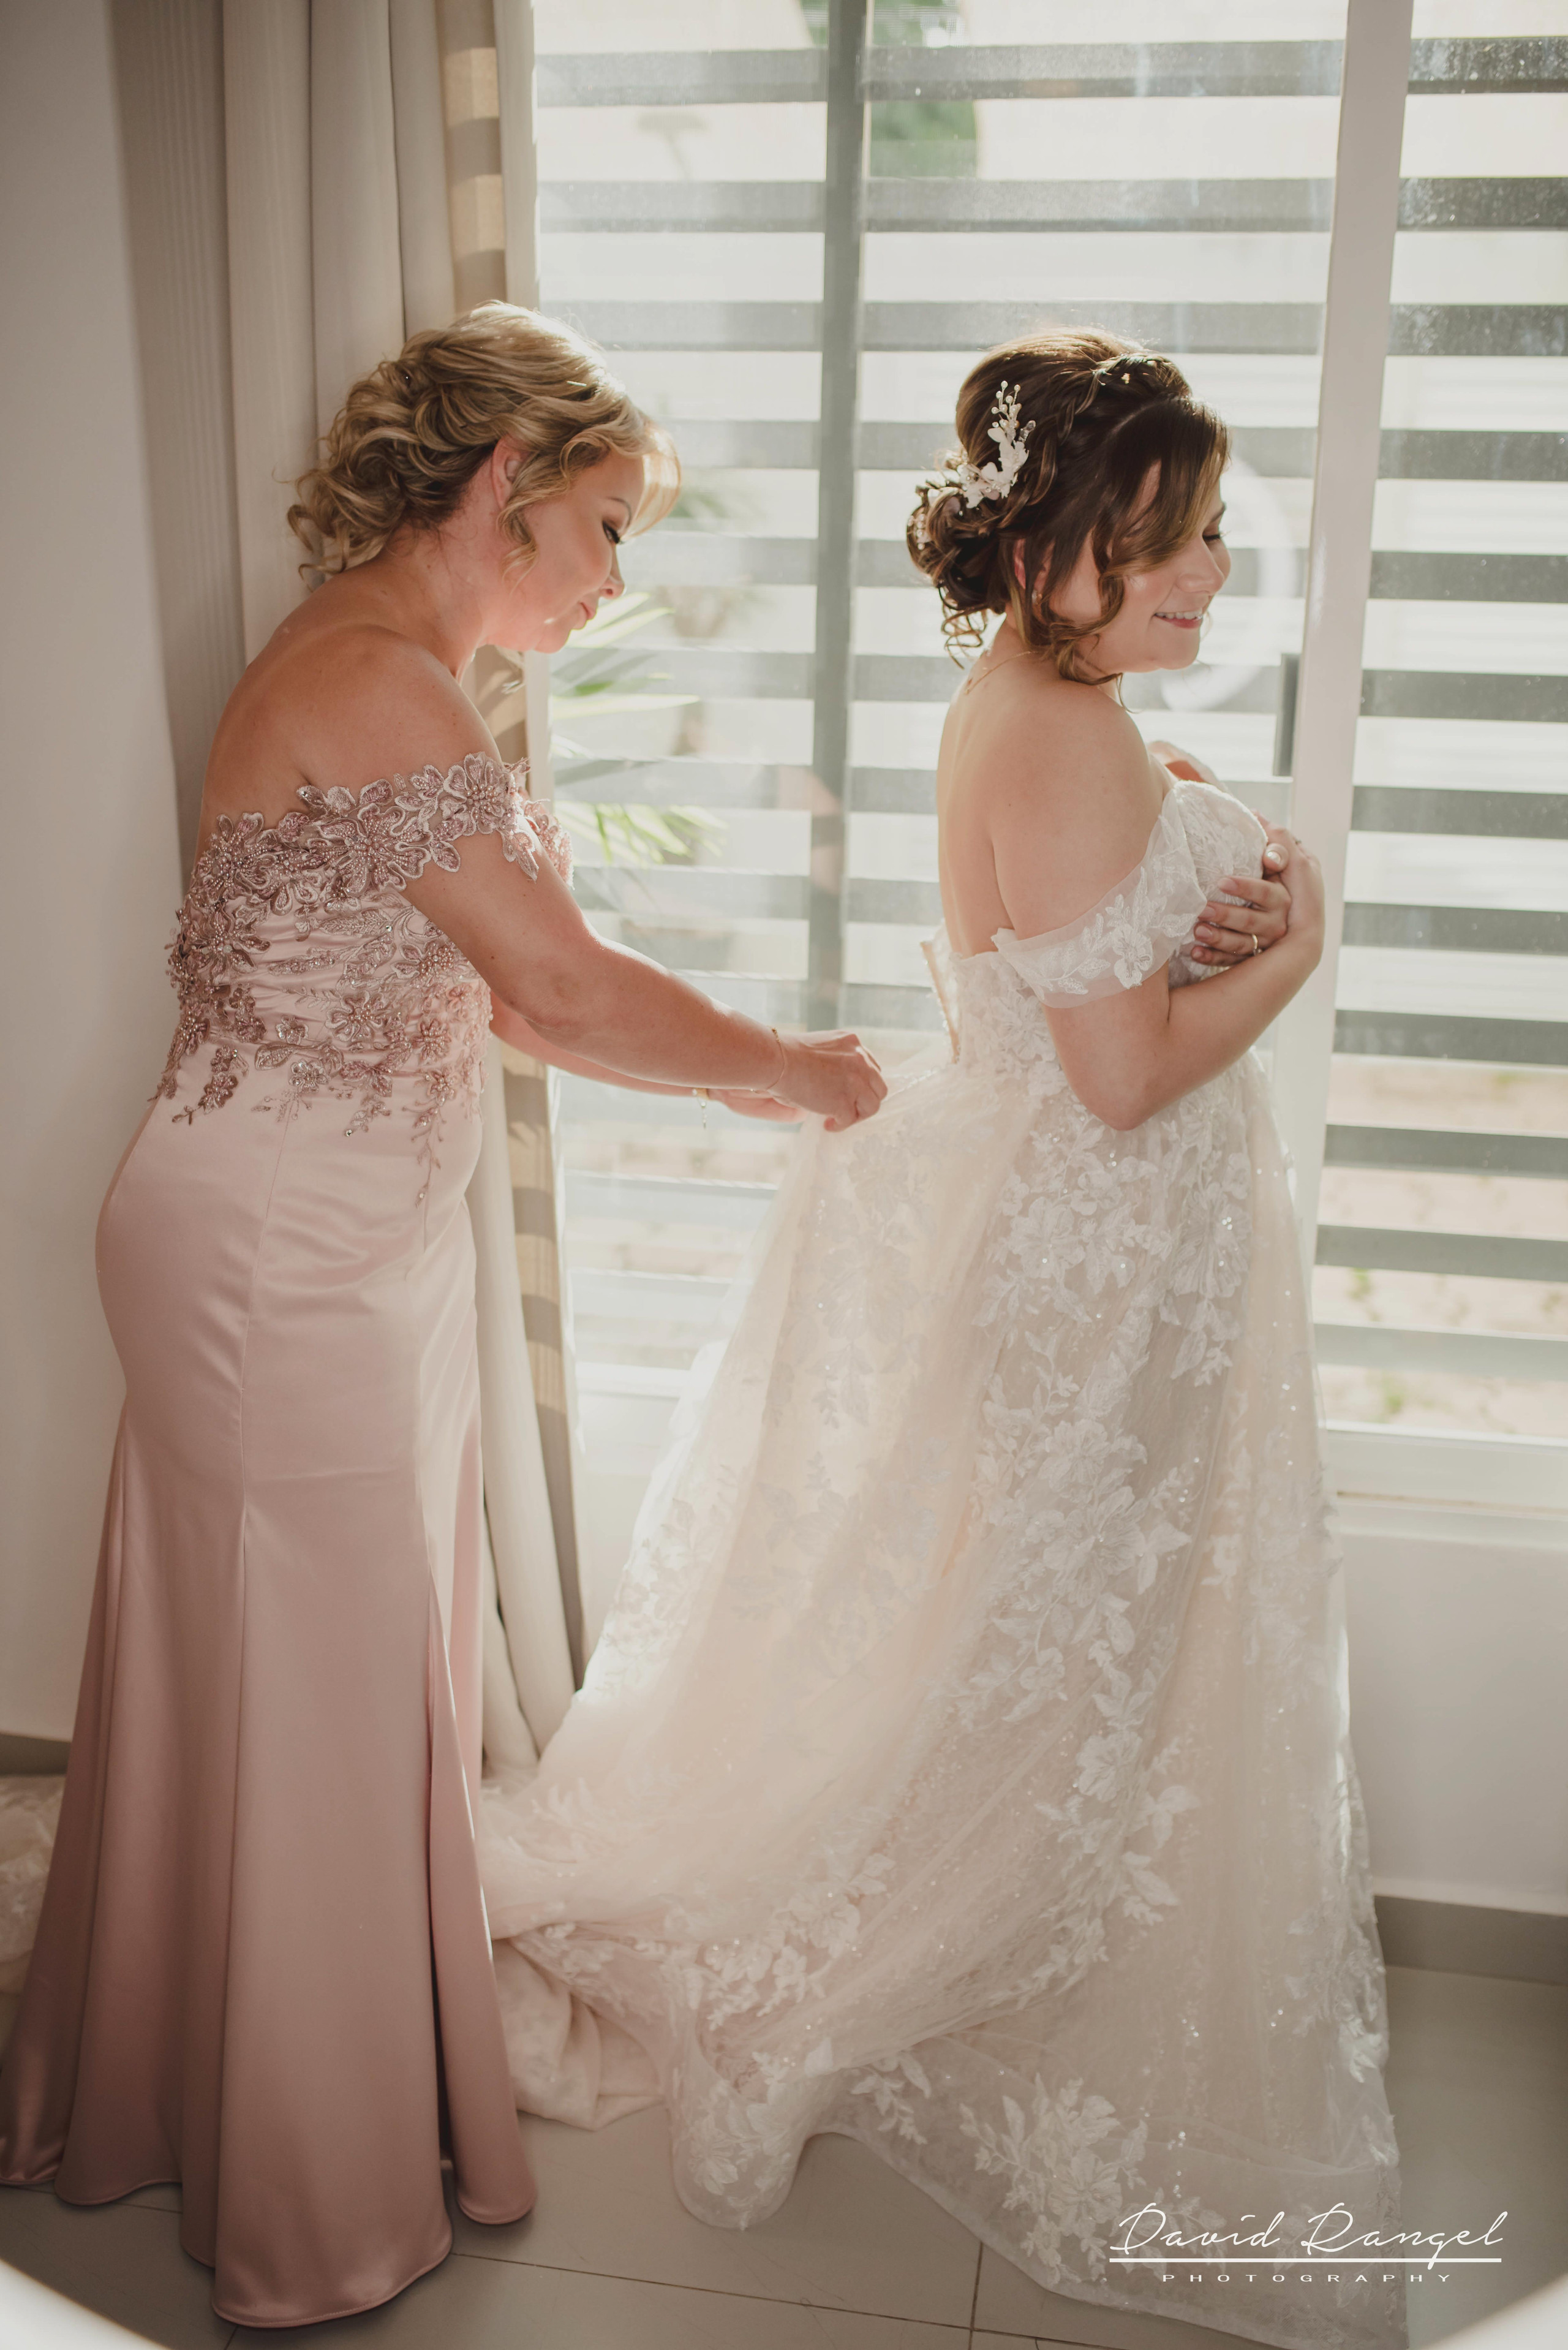 bride+getting+ready+shadow+earring++bathrobe+natural+ligh+photo+destination+wedding+isla+blanca+smile+mirror+photo+celebration+bridesmaids+mother+wedding+dress